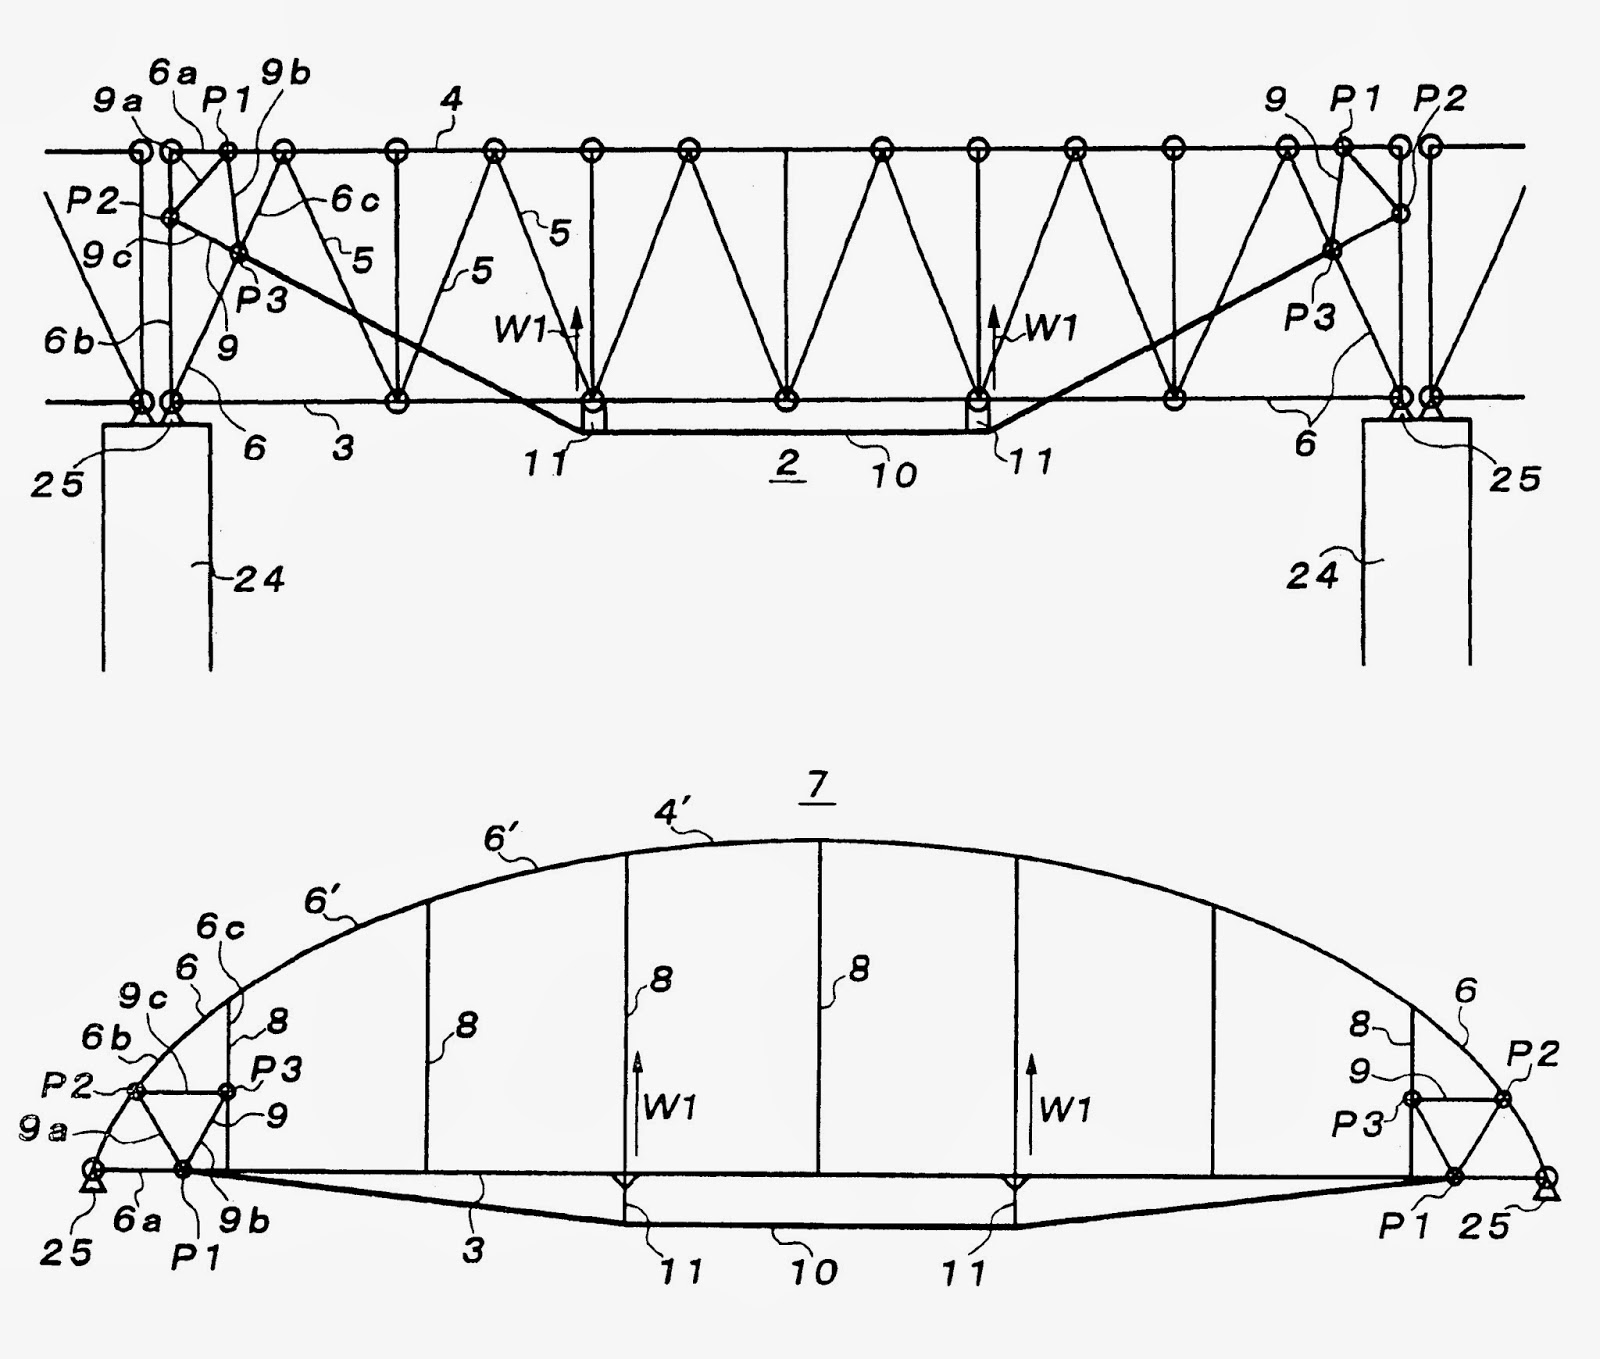 truss arch bridge combines the elements of the truss bridge